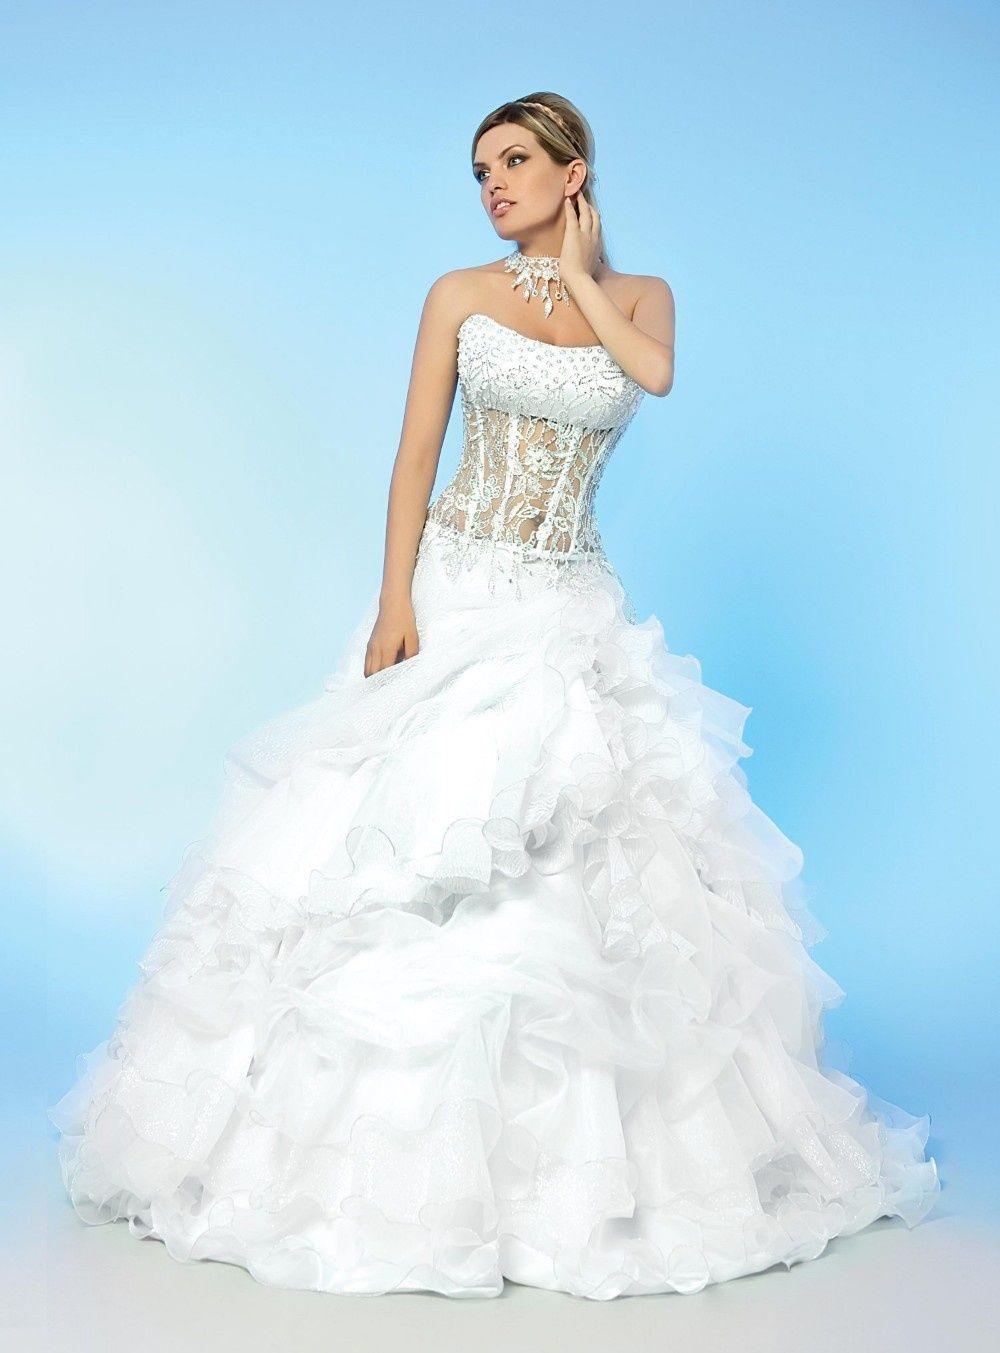 See through corset wedding dresses  see through ball gowns wedding dresses  barbie dresses u stuff